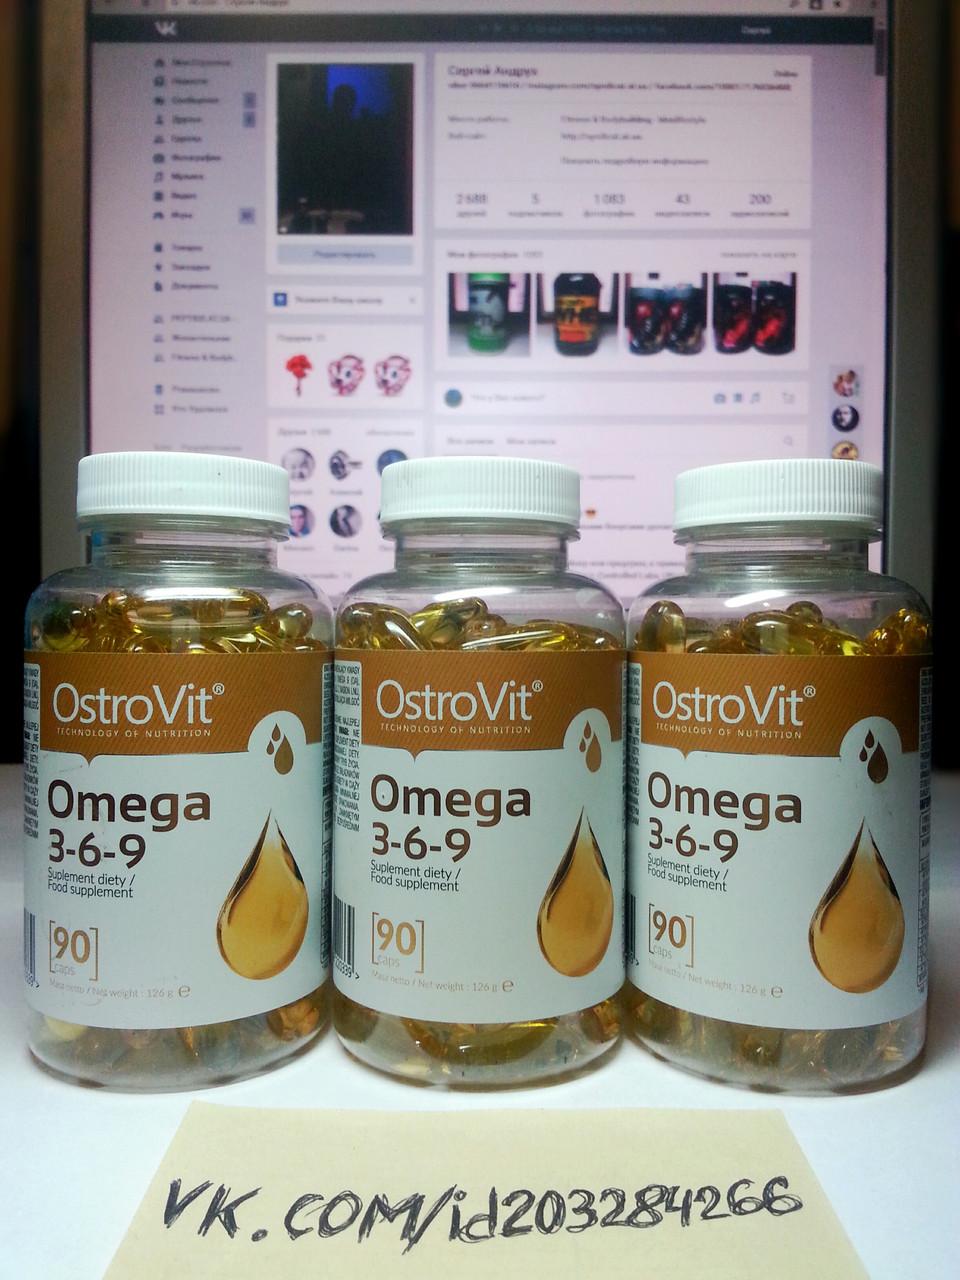 OstroVit Omega 3-6-9 90 капсул